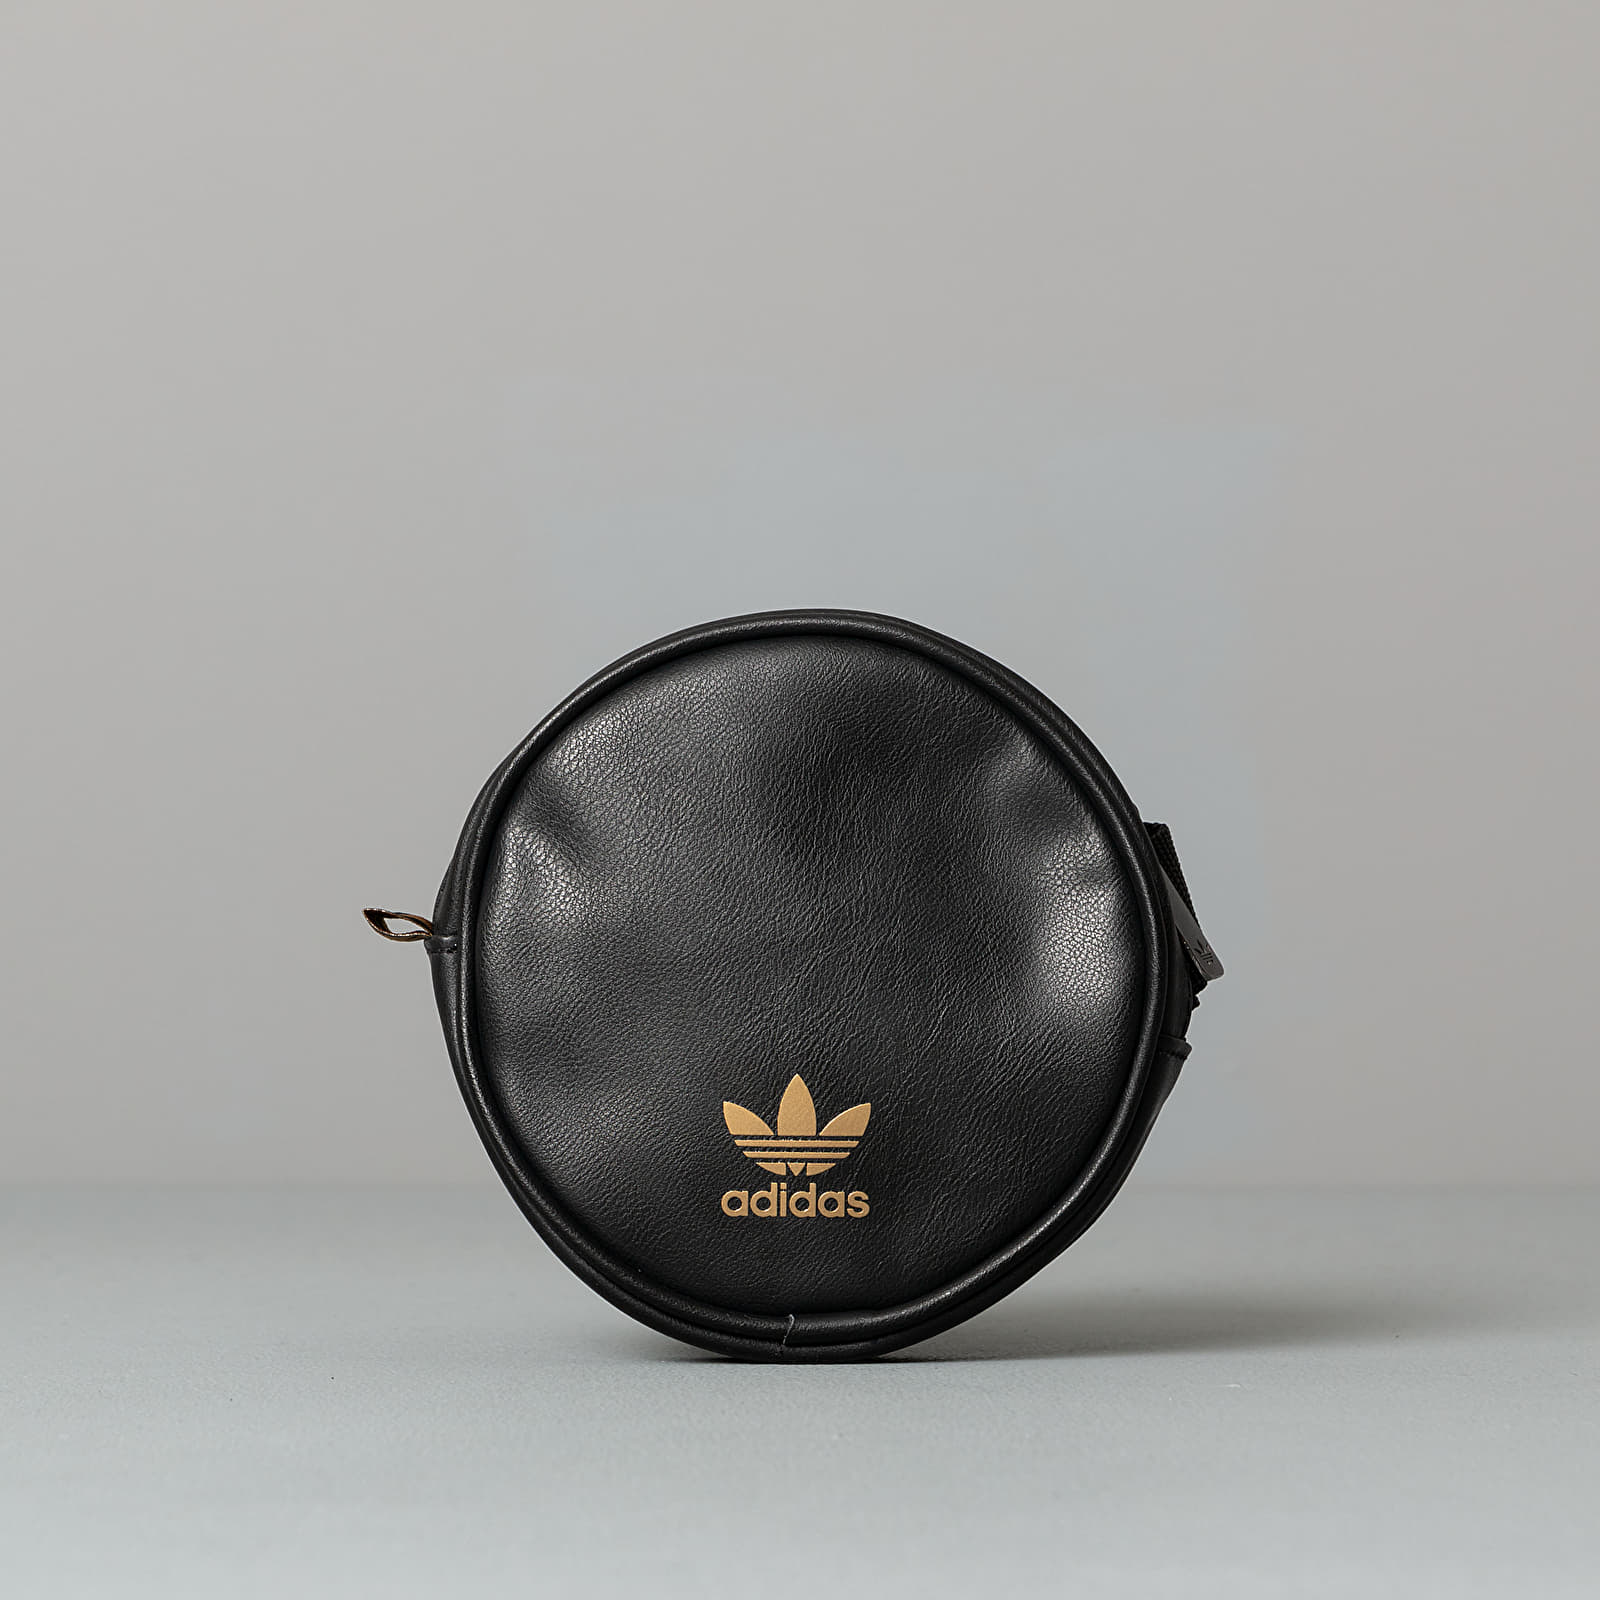 adidas Round Waistbag